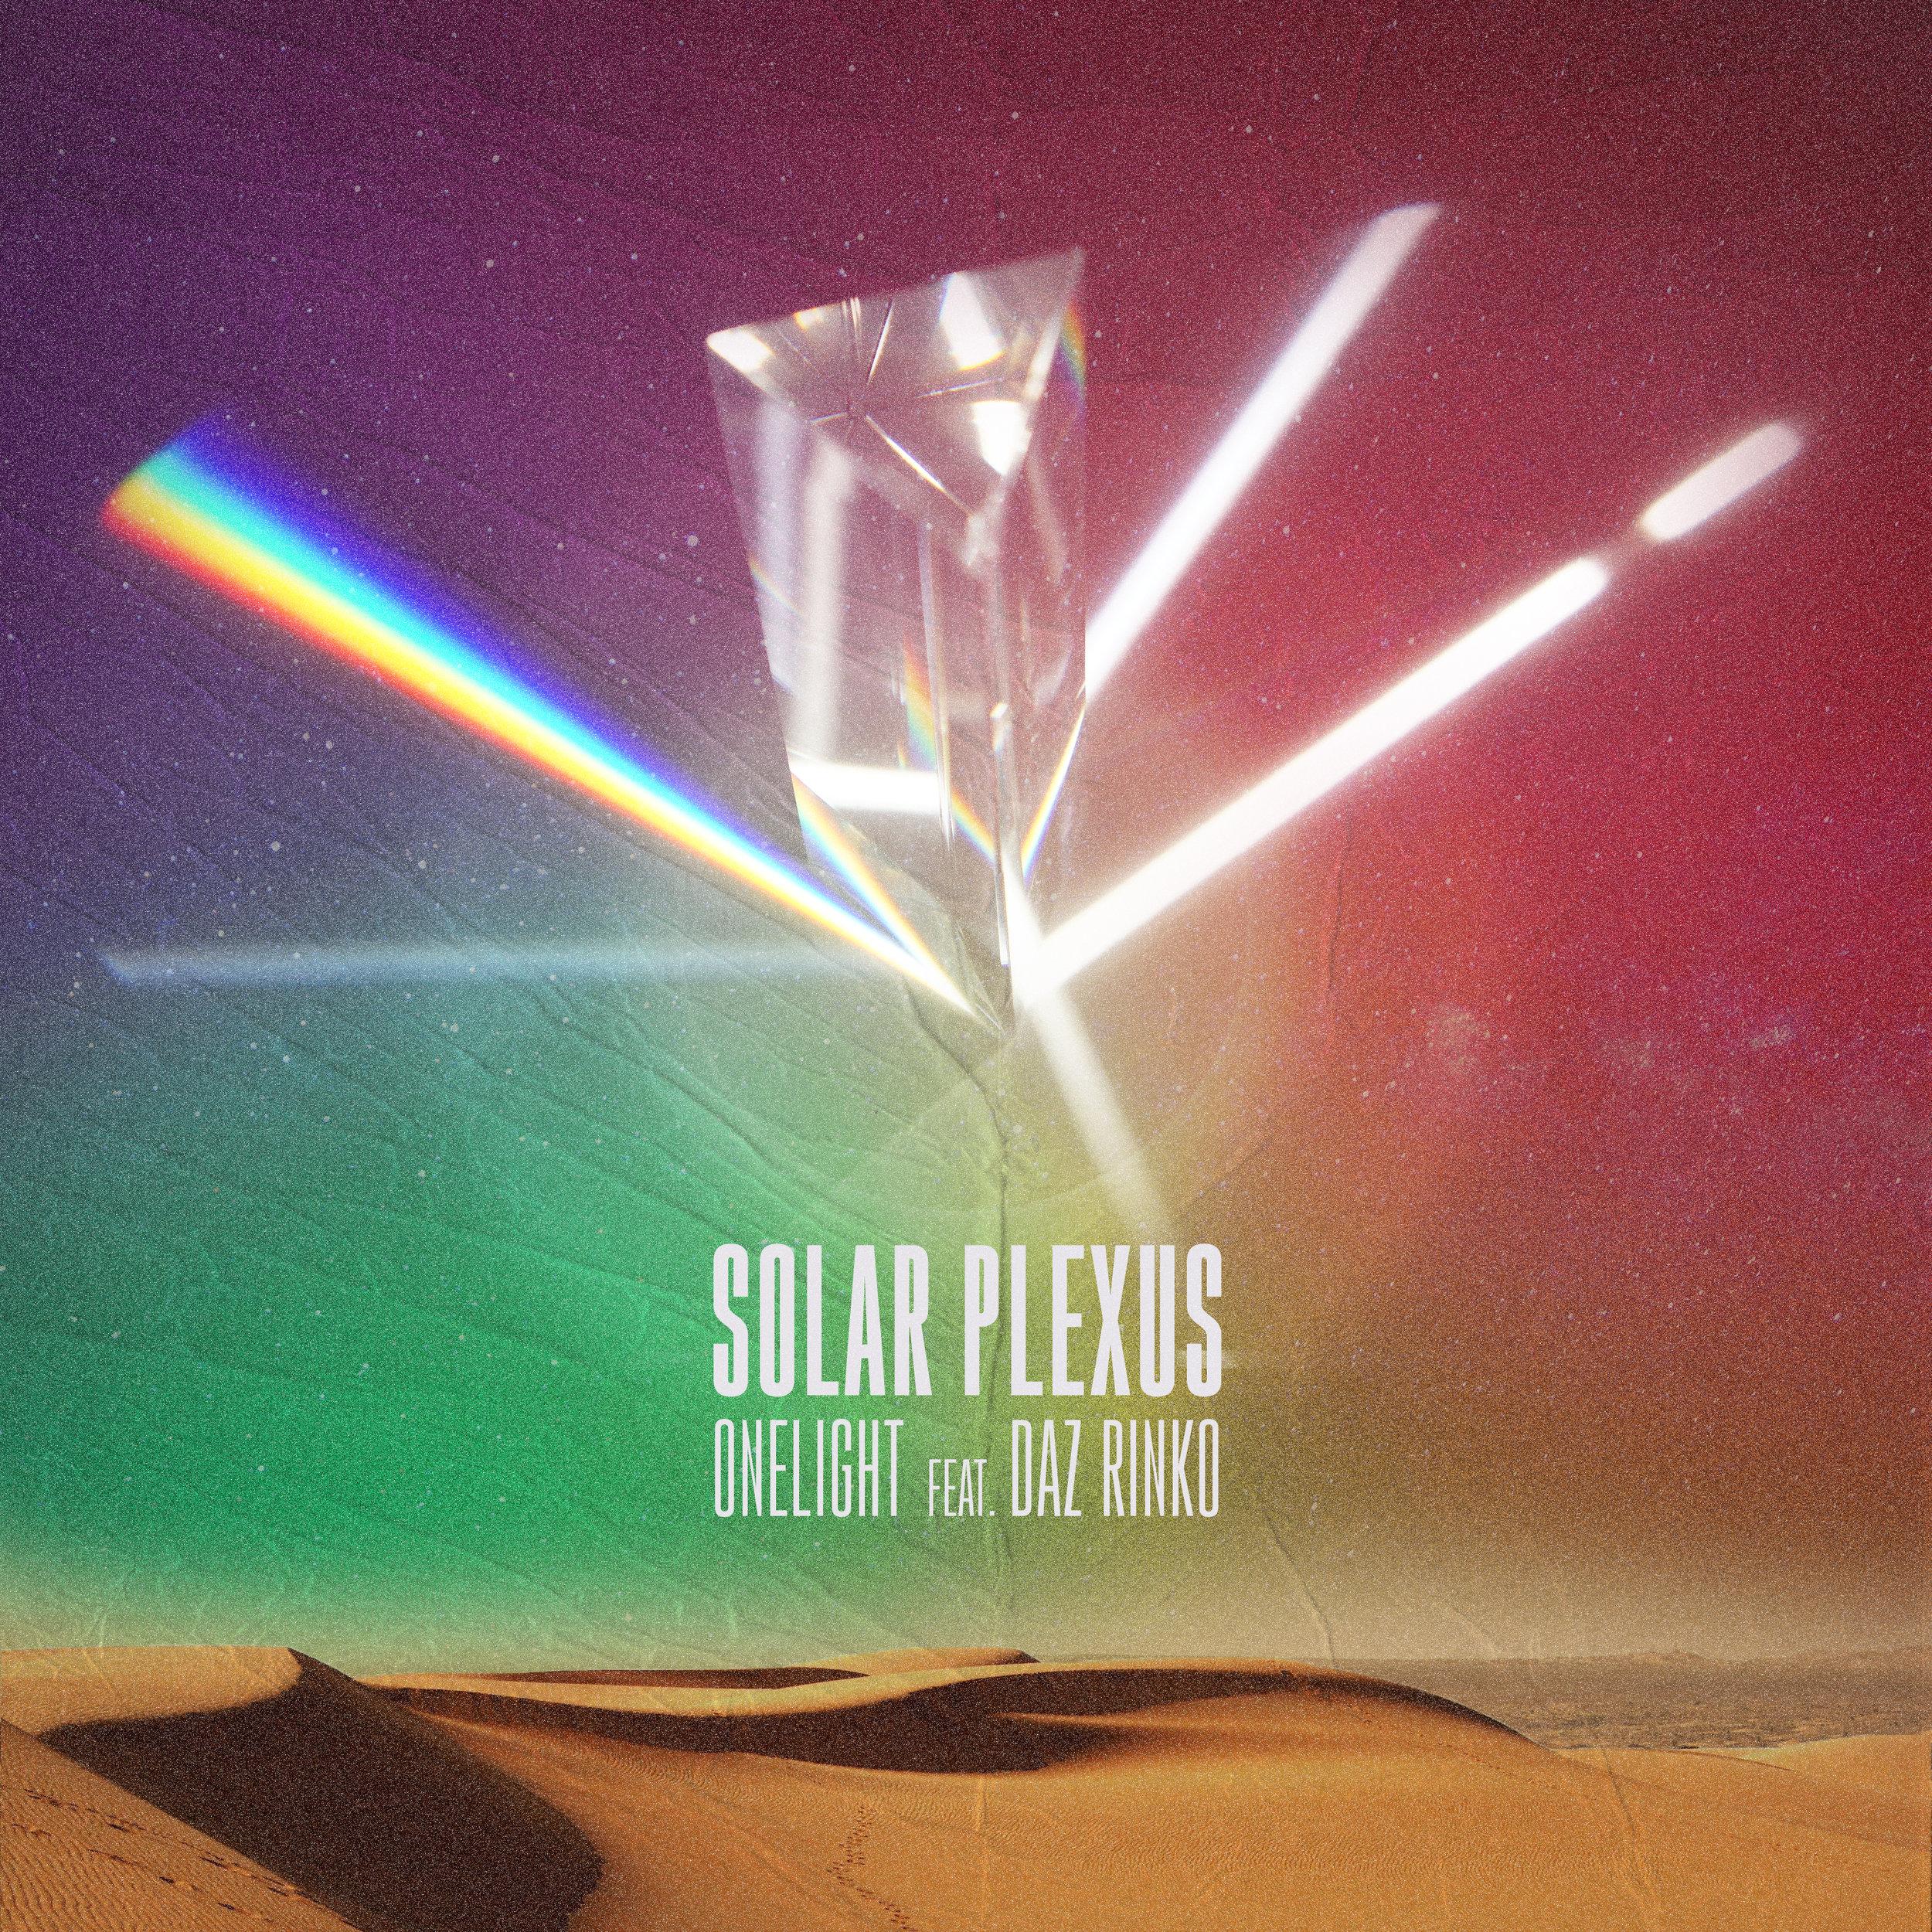 SOLAR PLEXUS - ONELIGHT feat. DAZ RINKO - Cover 3000px.jpg